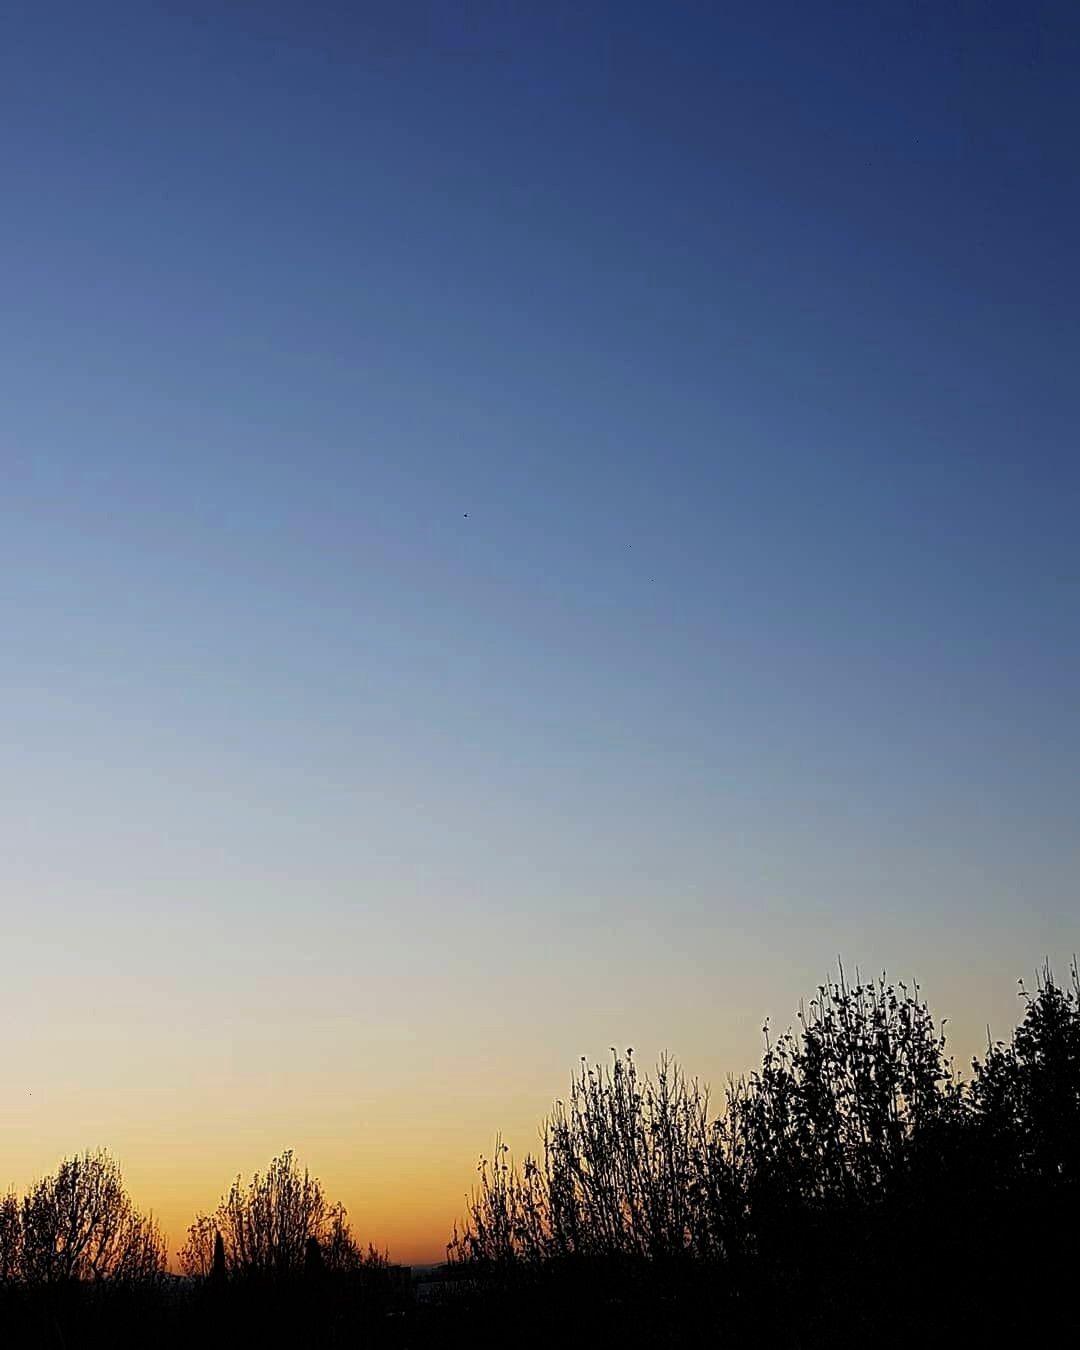 Autumn sunsets.  Figure da 1 a 4 Valiko per METABOX metabox.zone  @valiko_vintage  Winter is comin